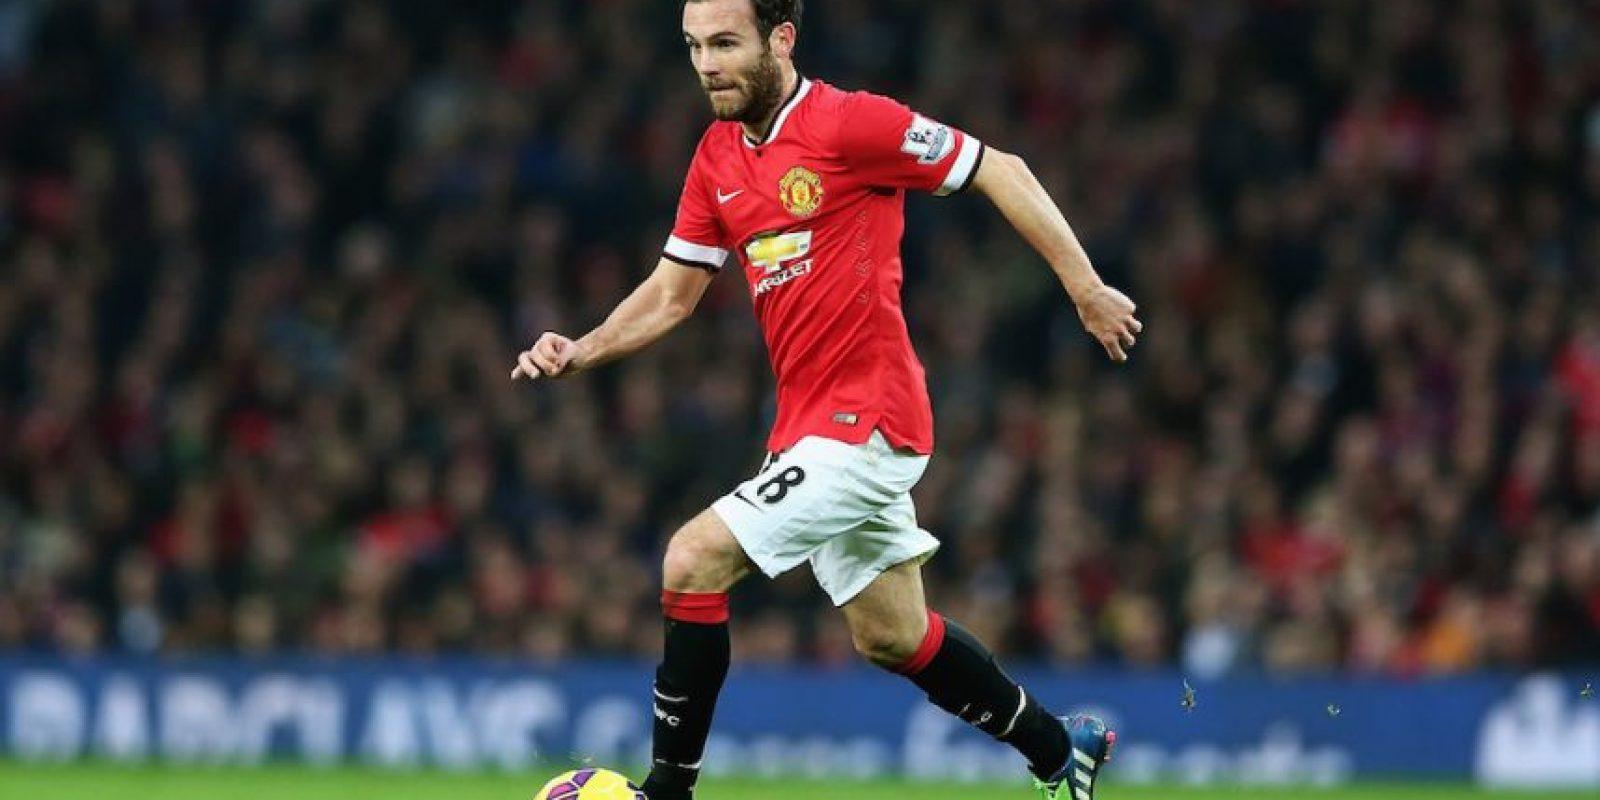 Mata, de 26 años de edad, salió del Chelsea para llegar al Manchester United. Foto:Getty Images